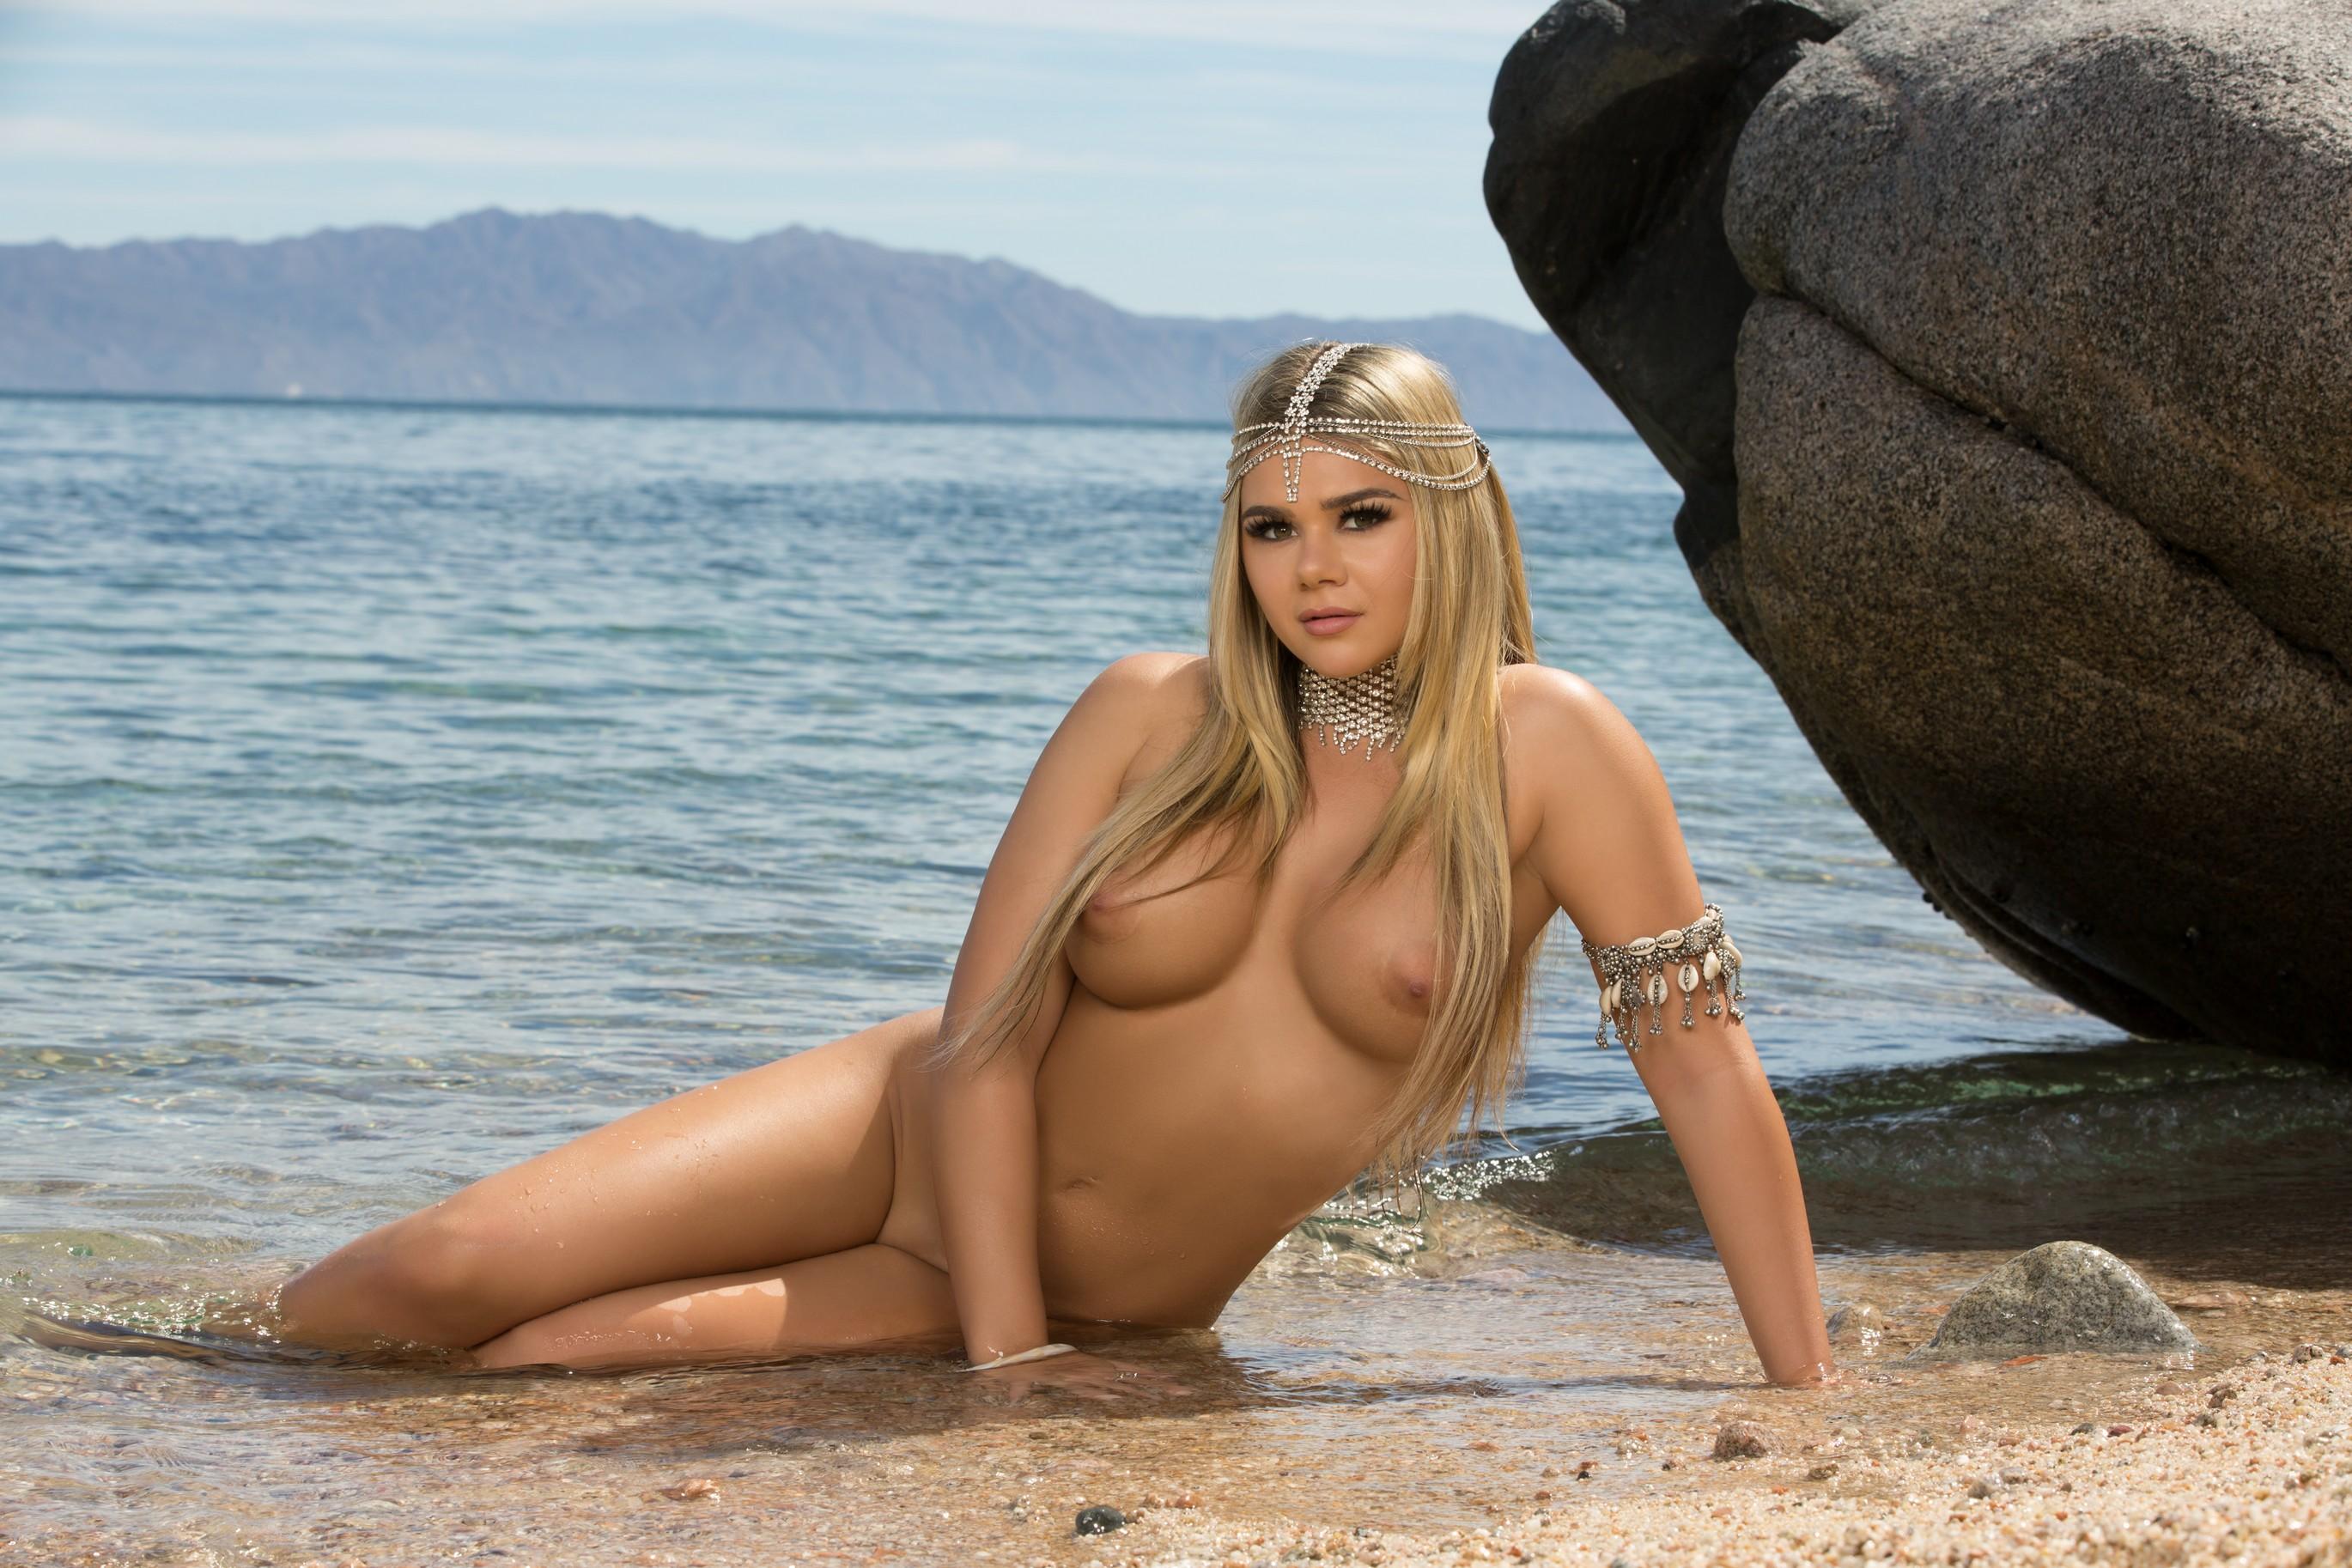 Shall Hot tan blonde nude beach babes